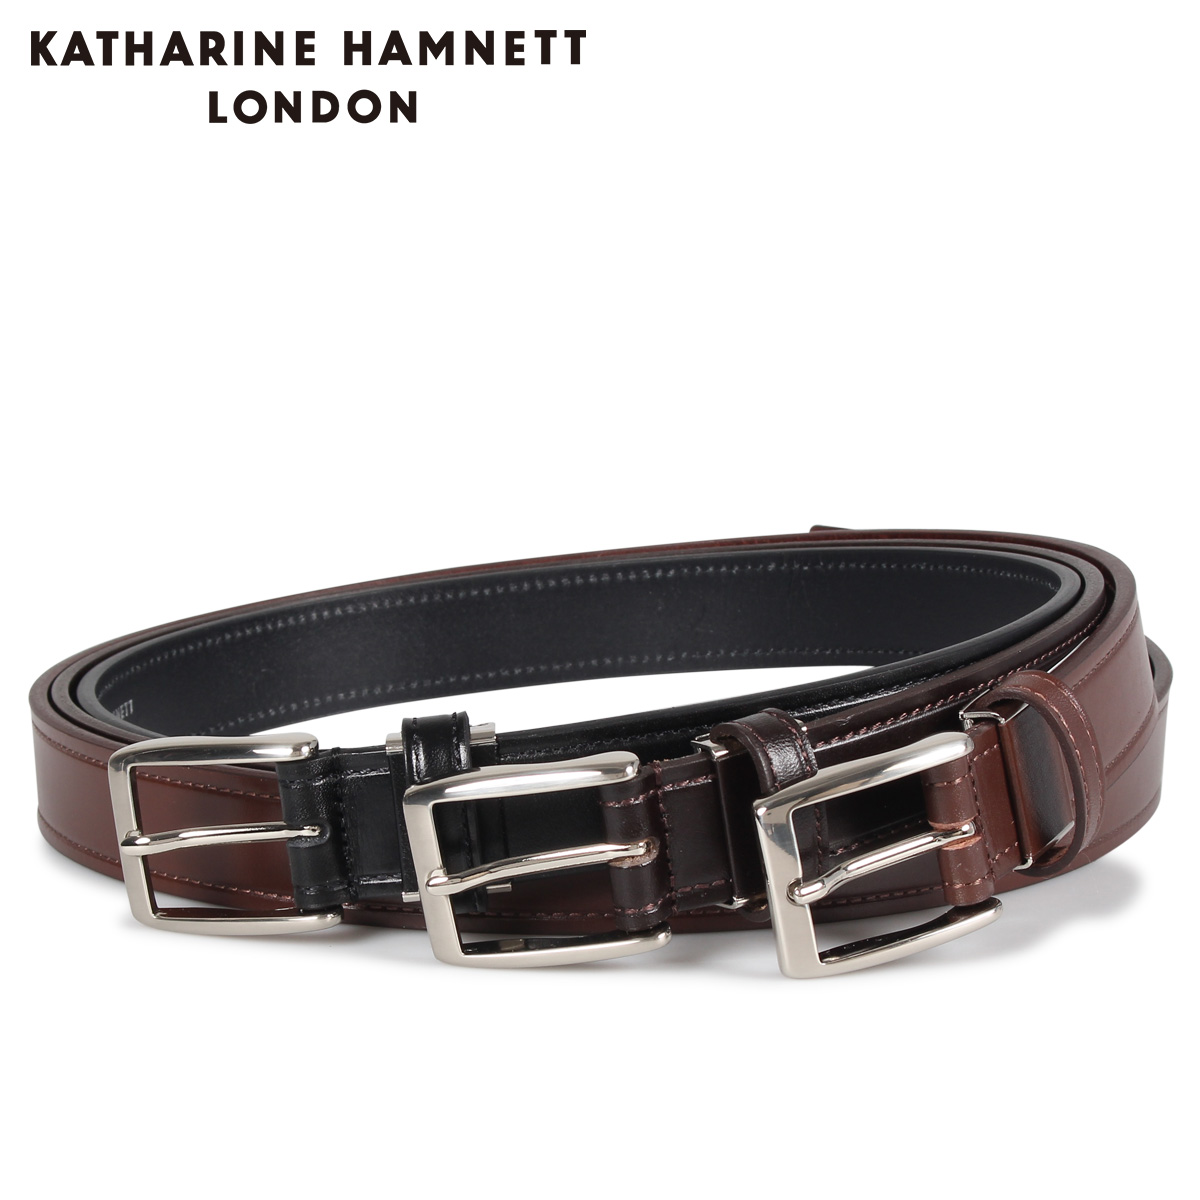 KATHARINE HAMNETT LONDON LEATHER BELT キャサリンハムネット ロンドン ベルト レザーベルト メンズ 本革 ブラック ブラウン ダーク ブラウン 黒 KH505025 [10/15 新入荷]